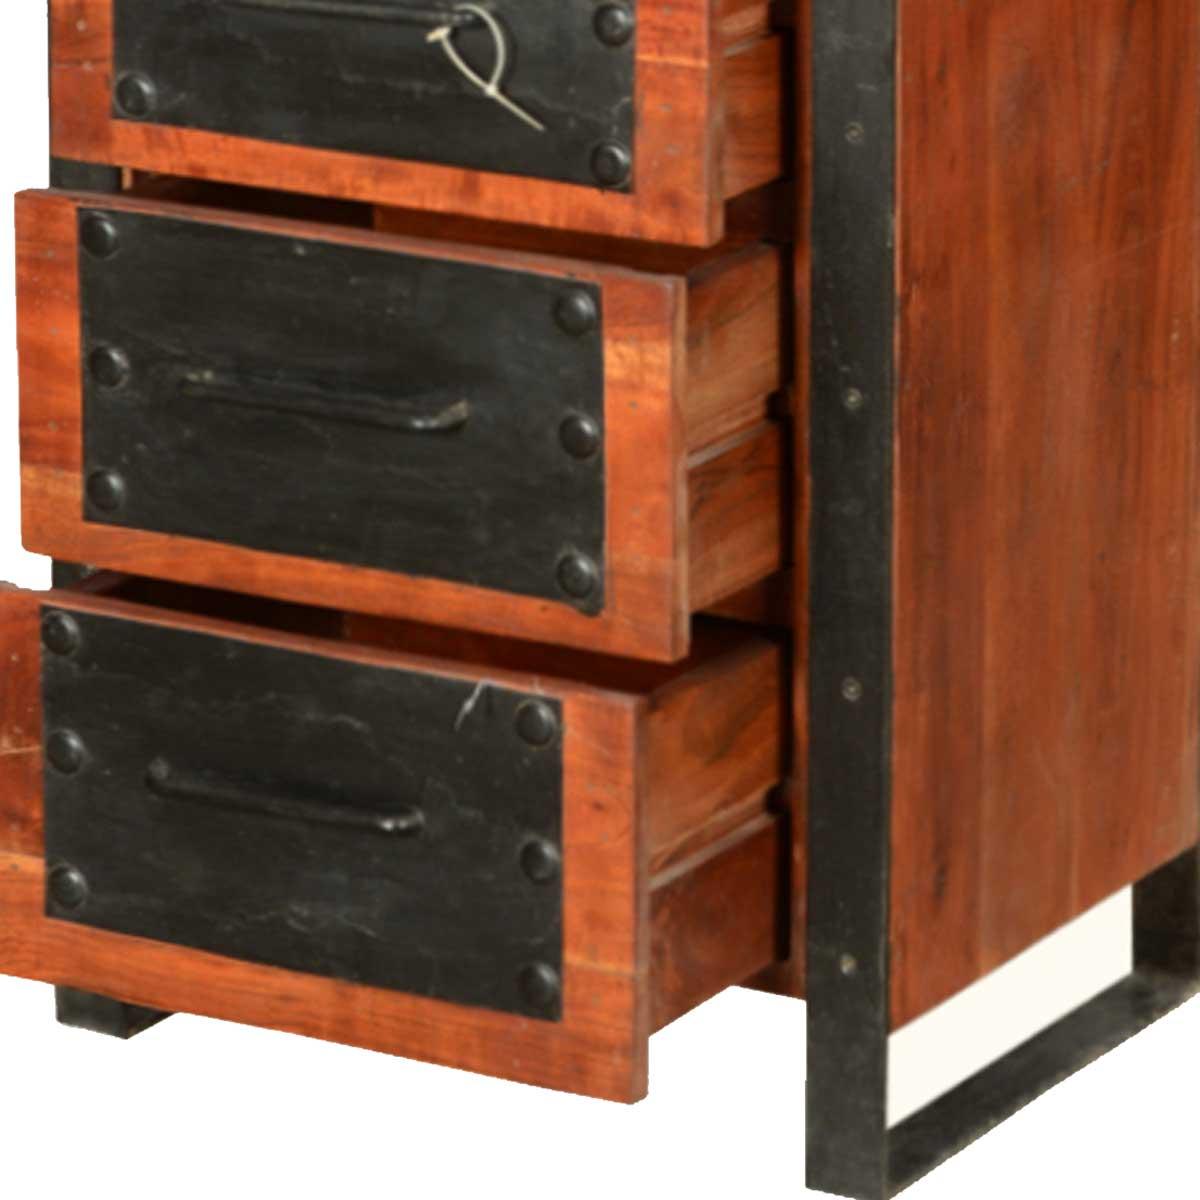 Nottingham Modern Mango Wood Amp Iron 3 Drawer 3 Shelf Tower